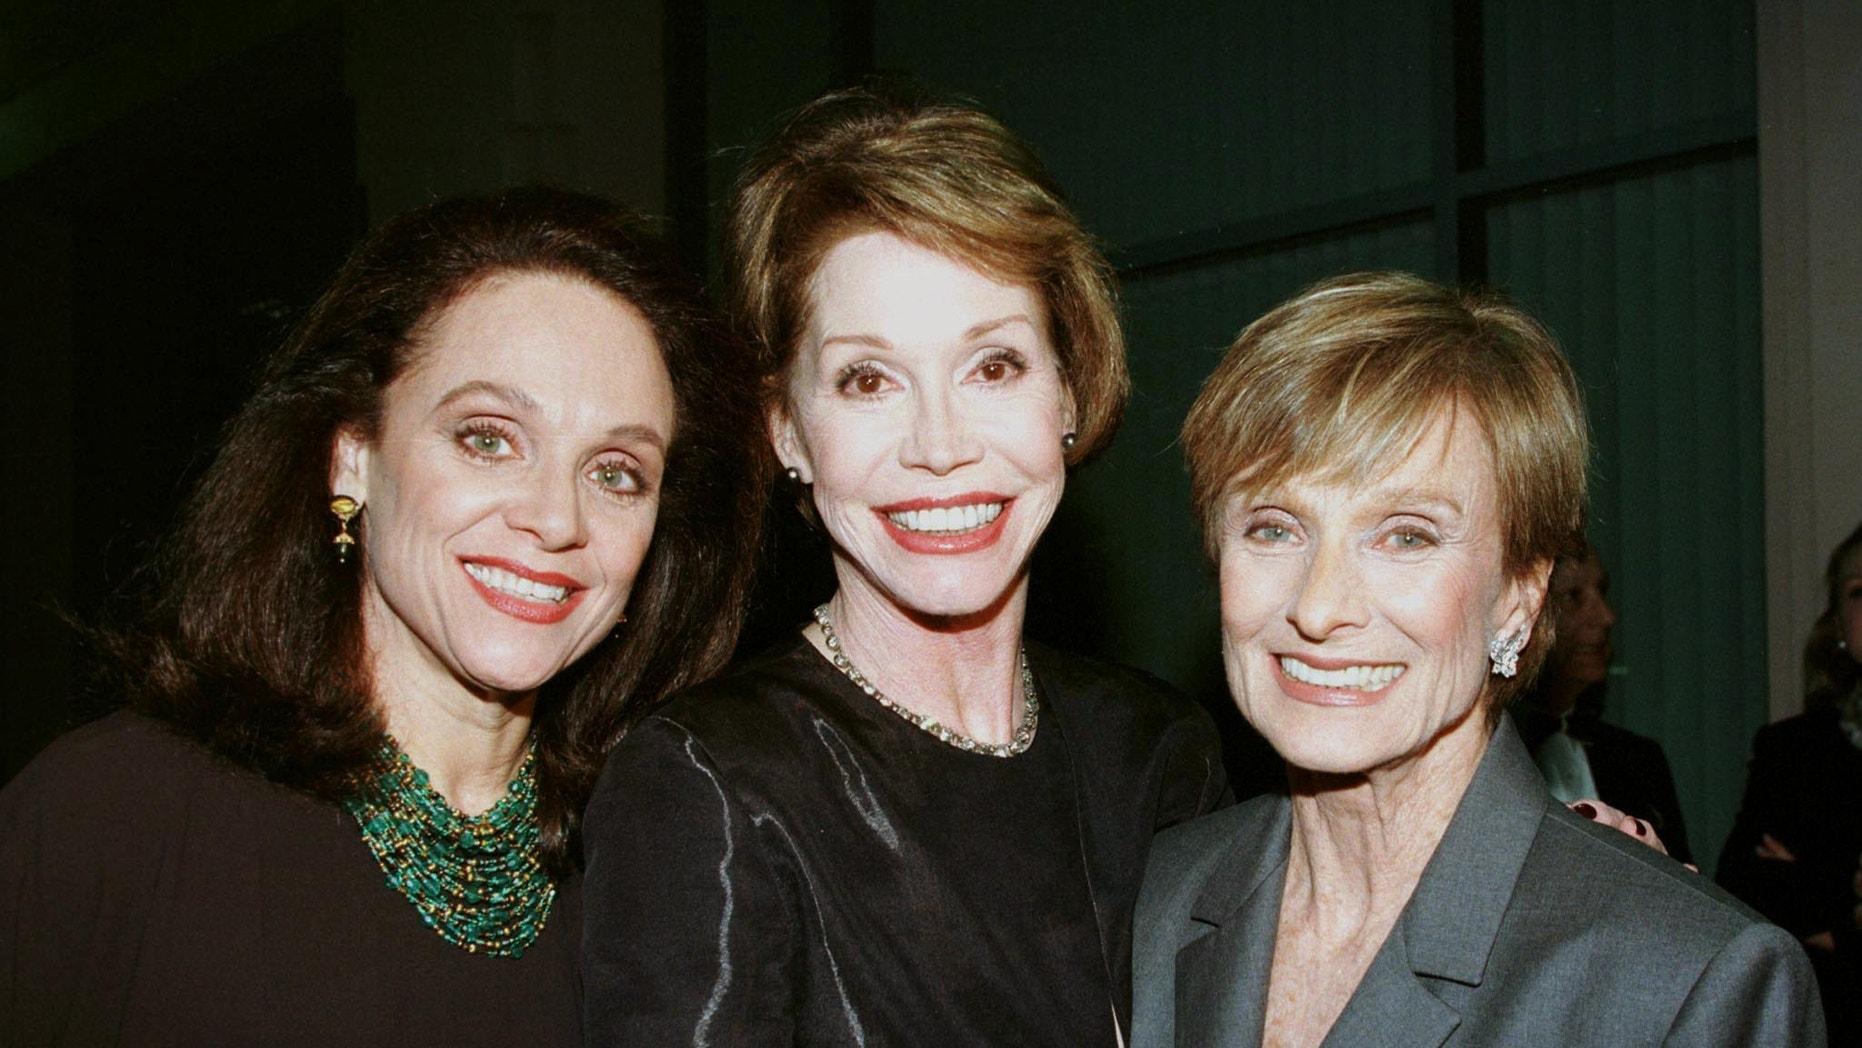 Valerie Harper, Mary Tyler Moore and Cloris Leachman.